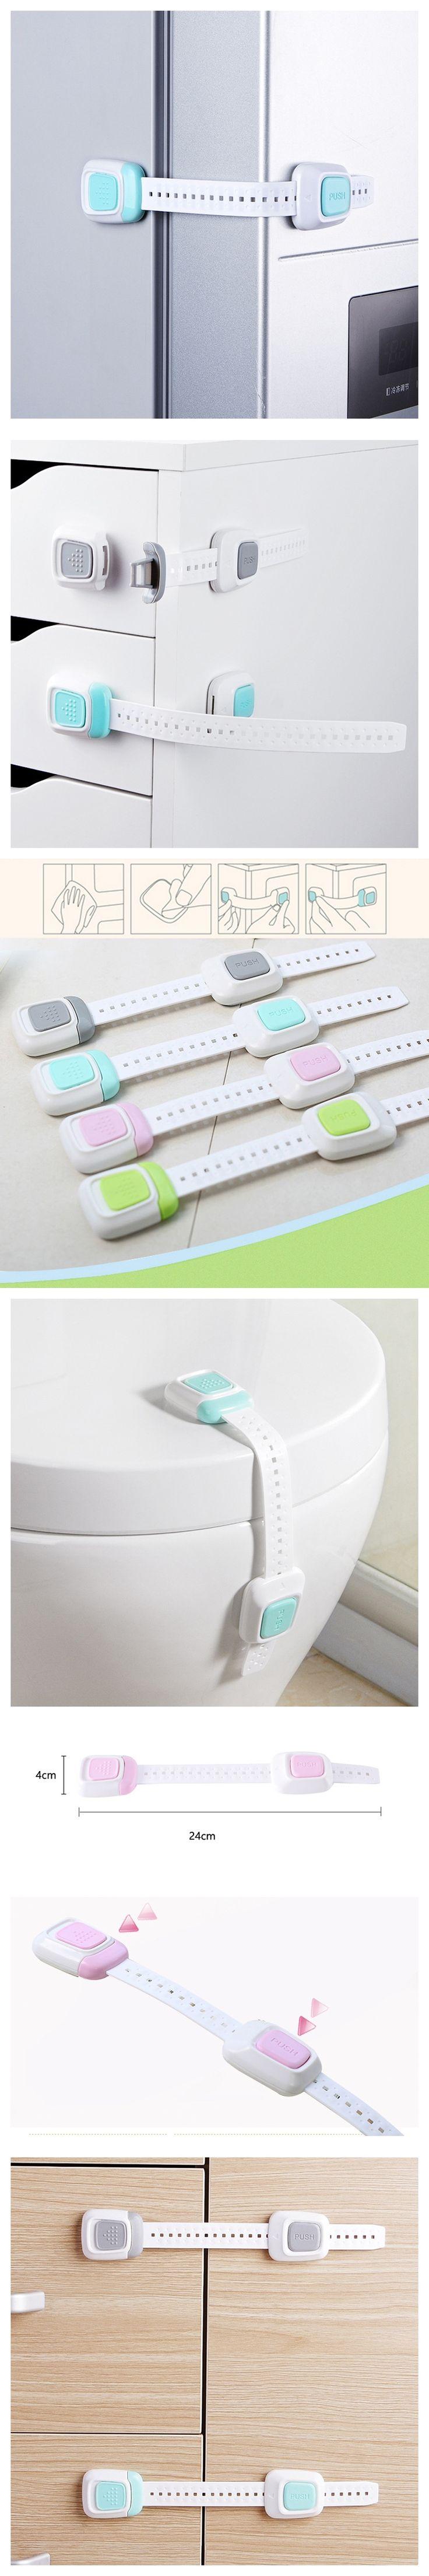 12Pcs Multi-function Double Button Children 's Security Lock Baby Protective Equipment Anti-folder Hand Refrigerator Lock